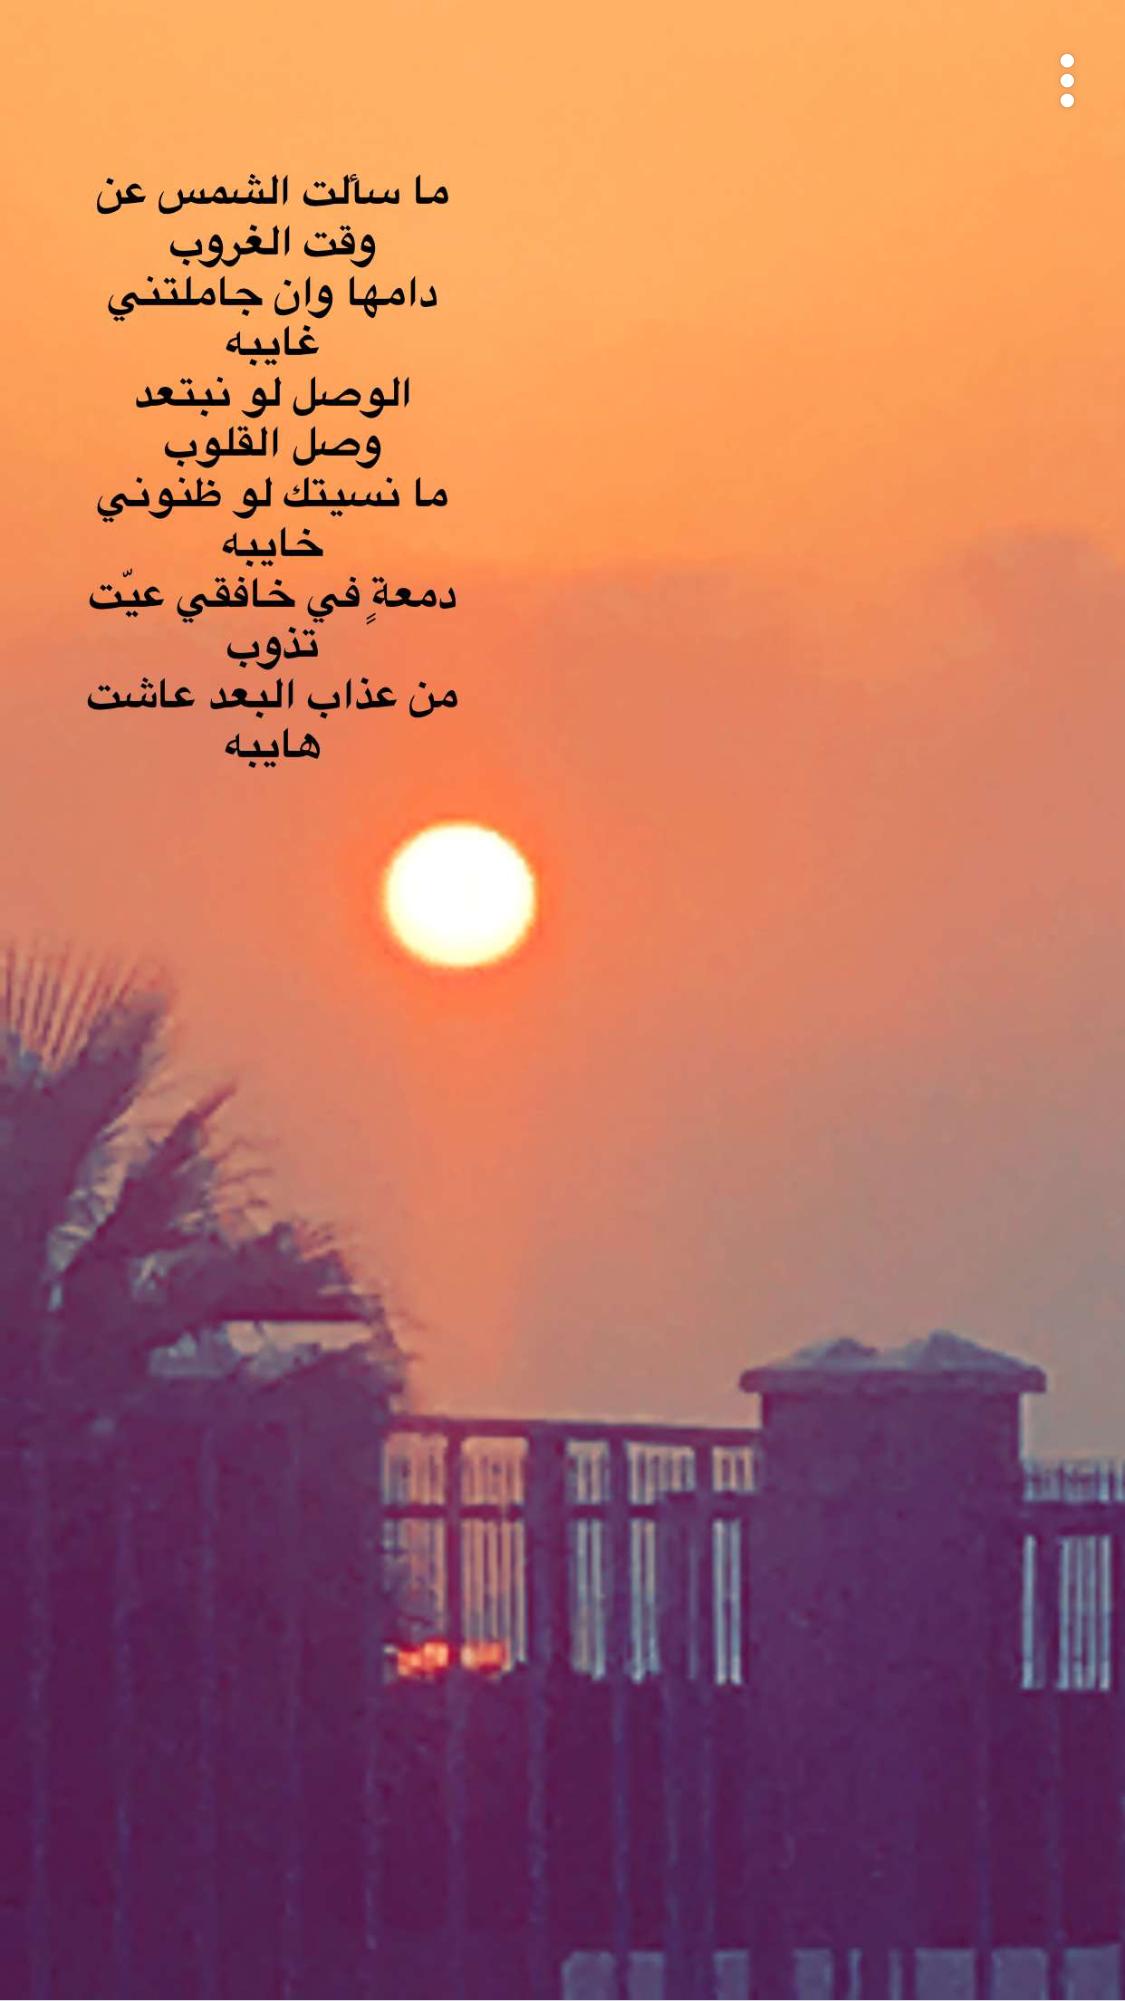 Pin By روابى المطيرى On صور Poster Movie Posters Screenshots